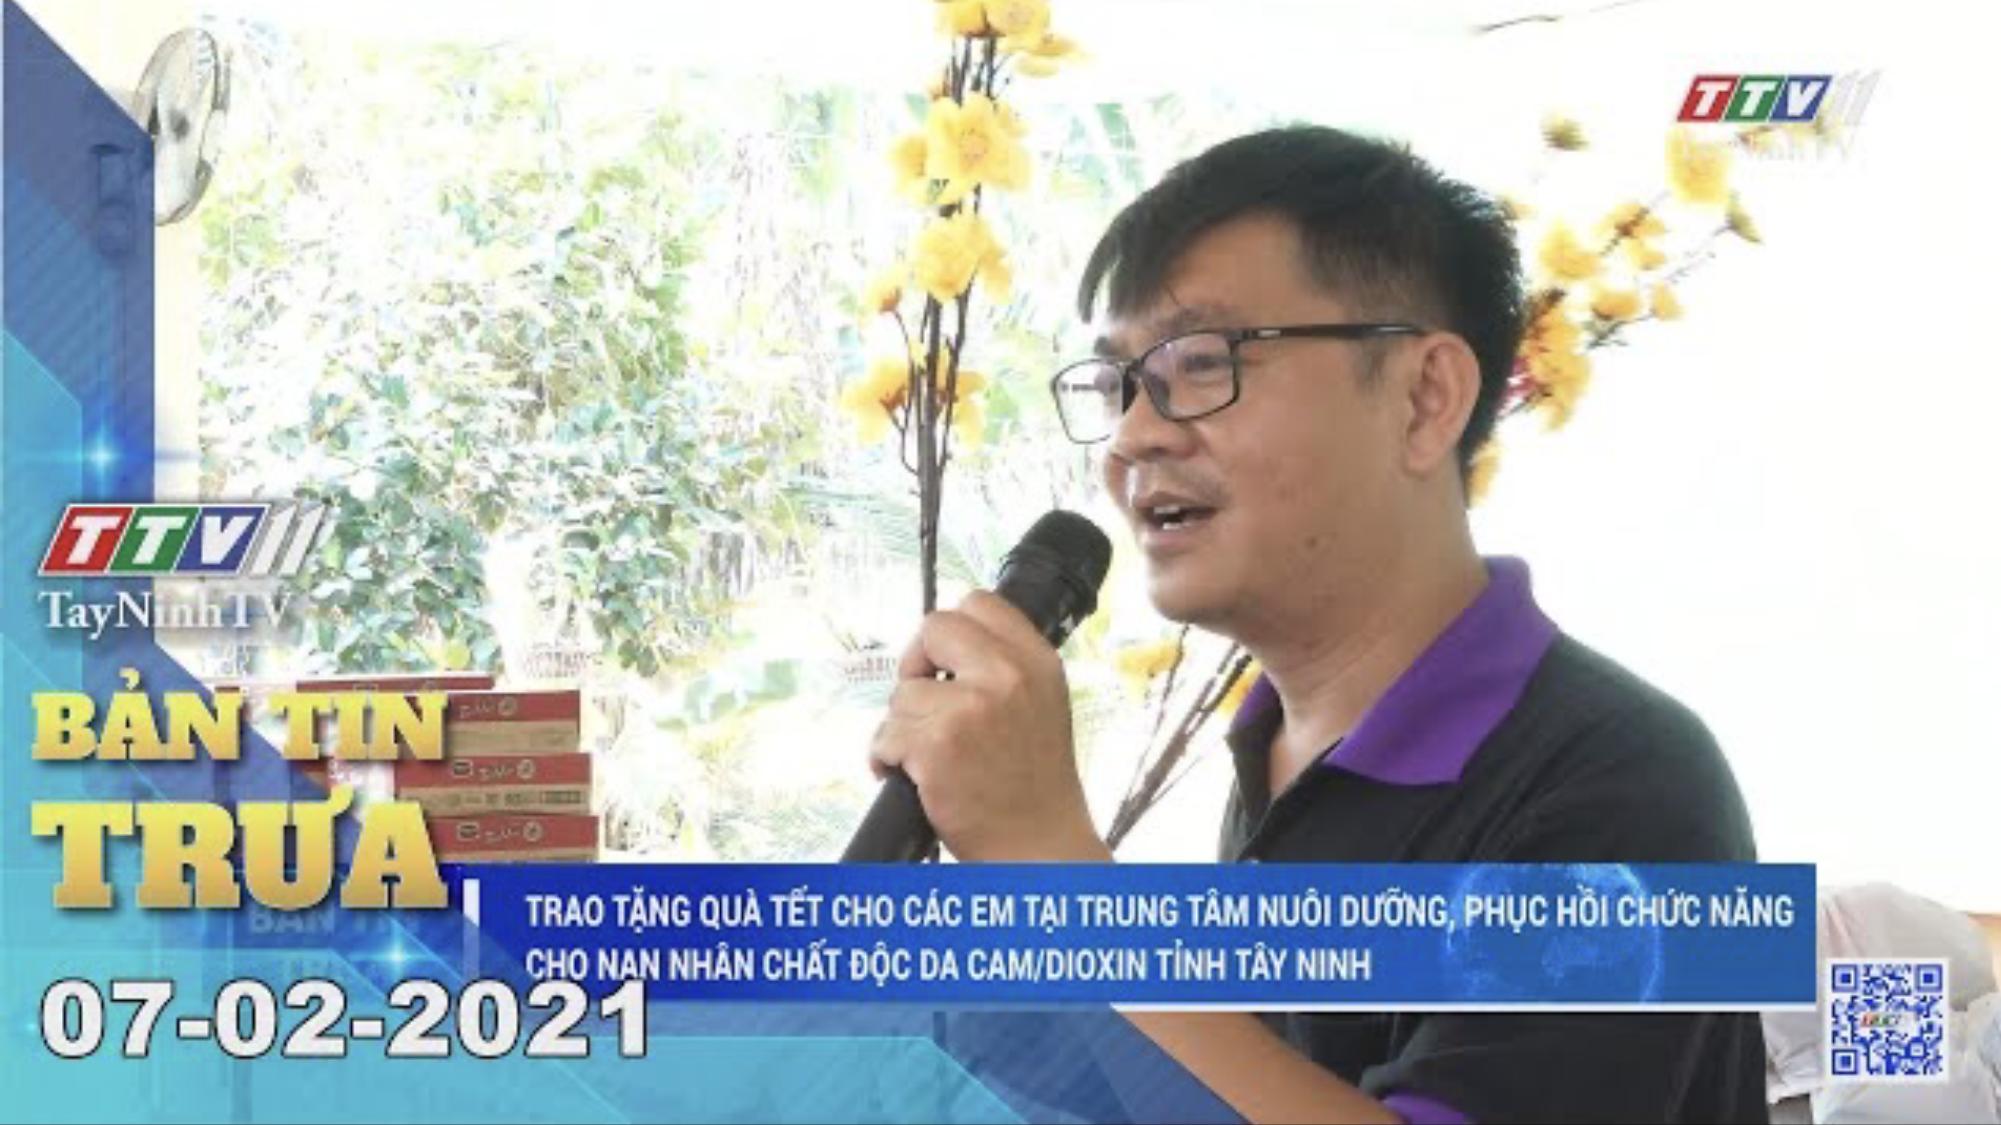 Bản tin trưa 07-02-2021 | Tin tức hôm nay | TayNinhTV